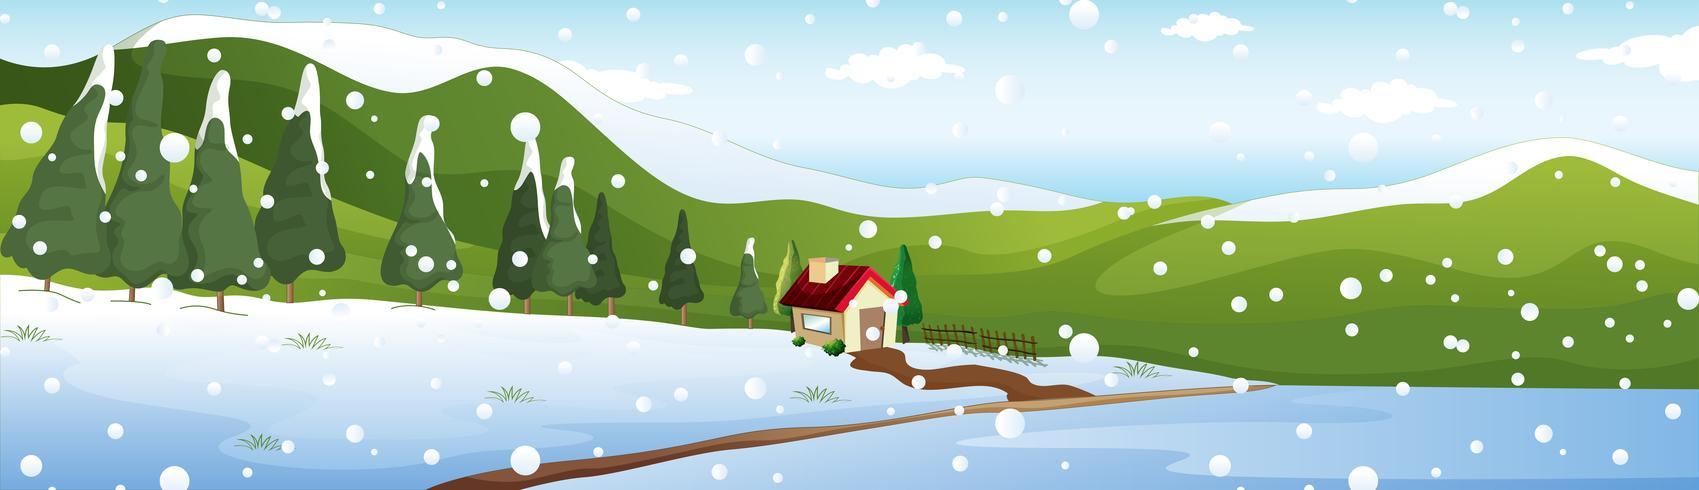 Bakgrundsscen med hus på vintern